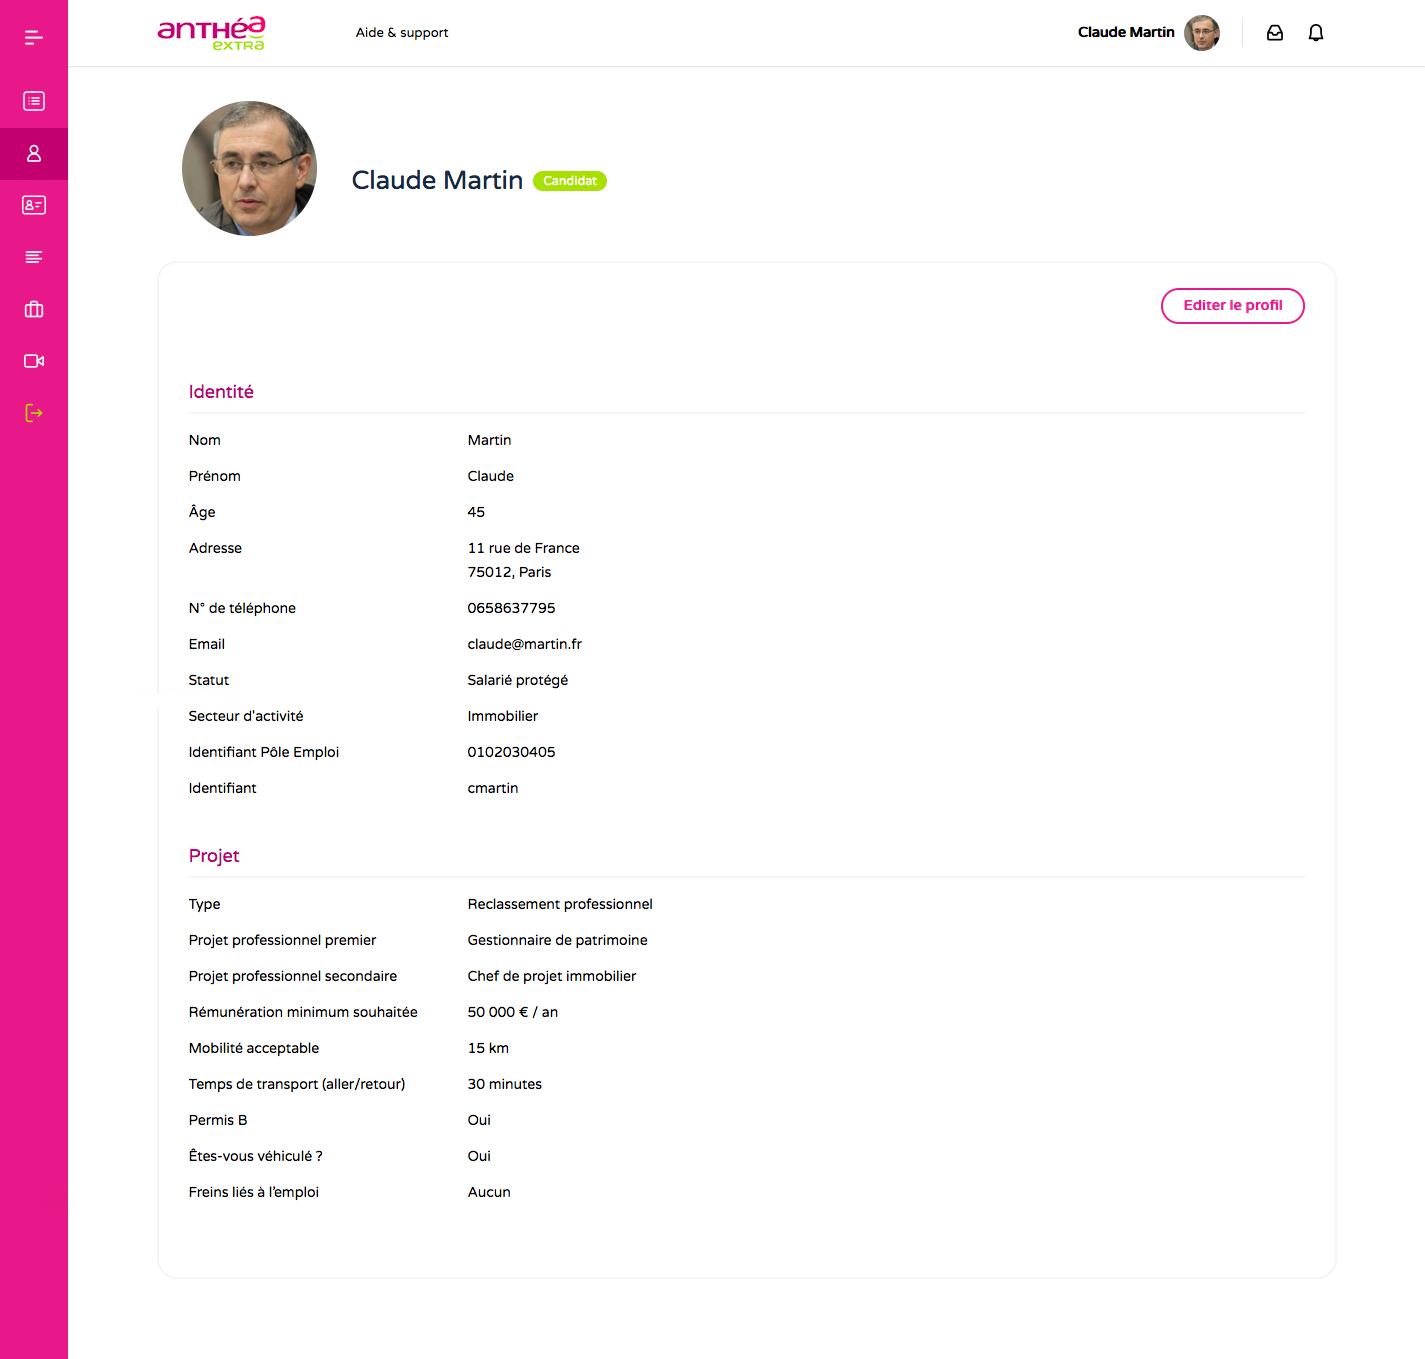 Profil candidat sur Anthea Extra